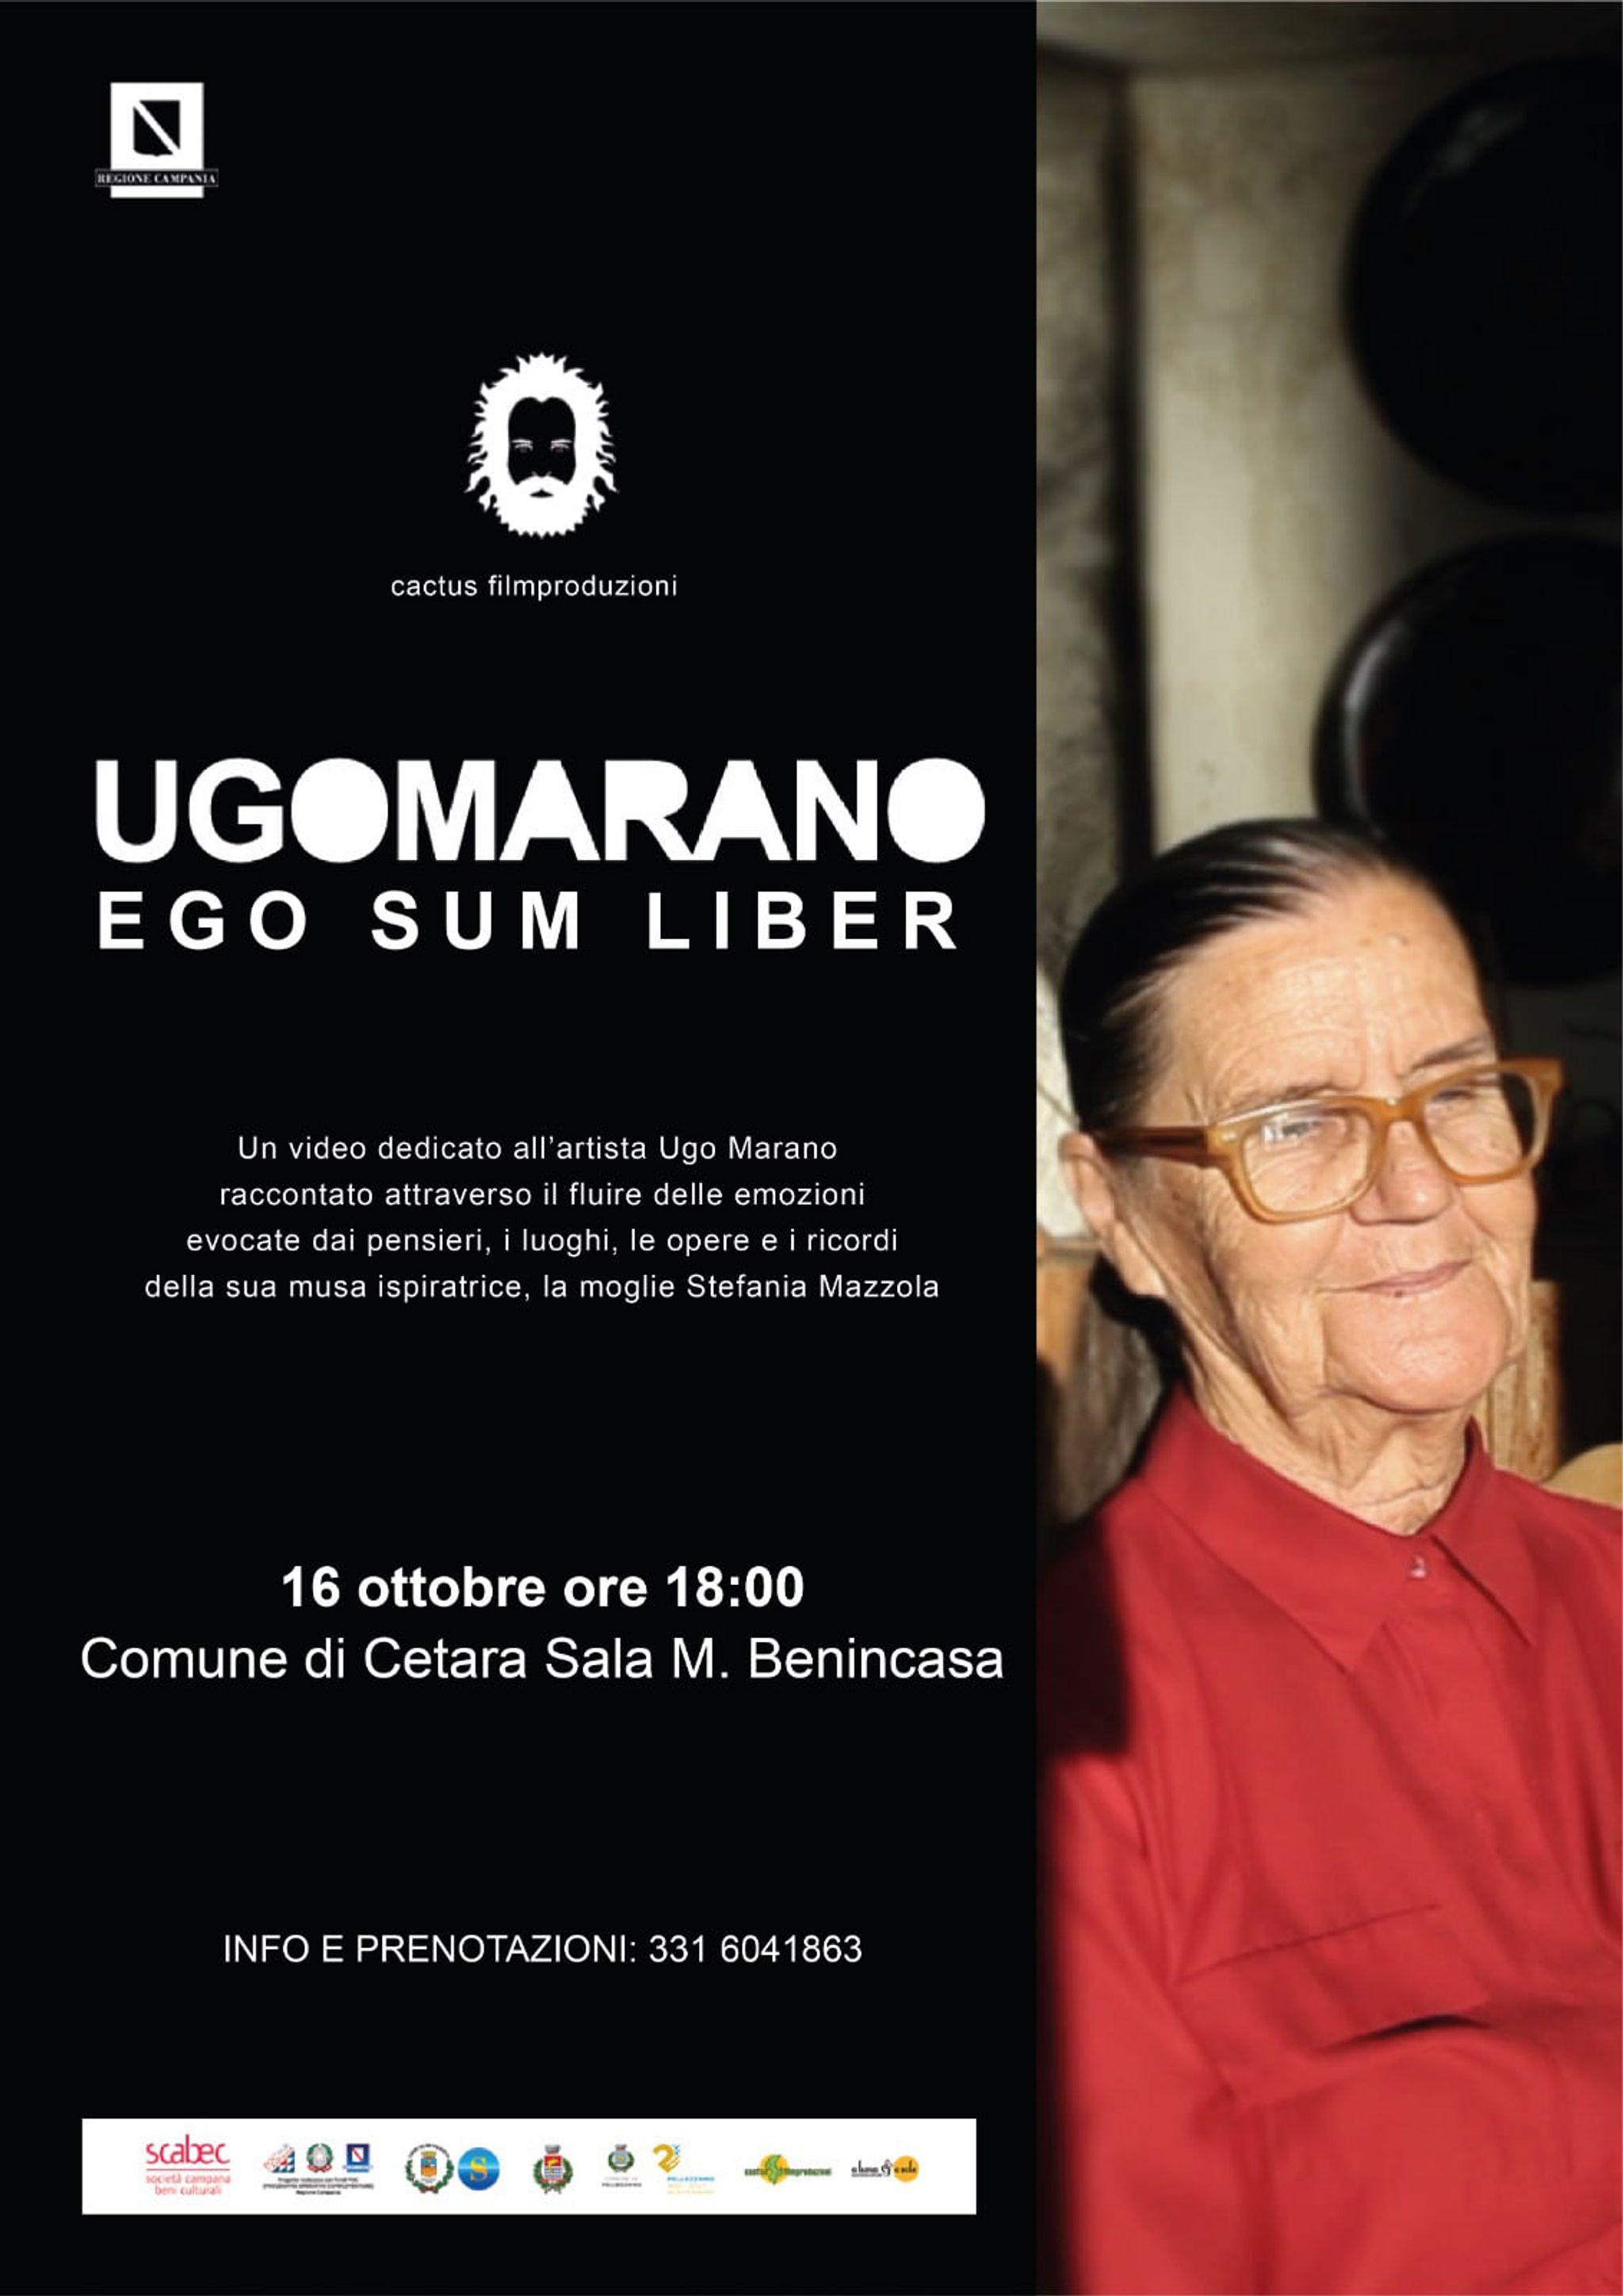 UGO MARANO, Ego Sum Liber